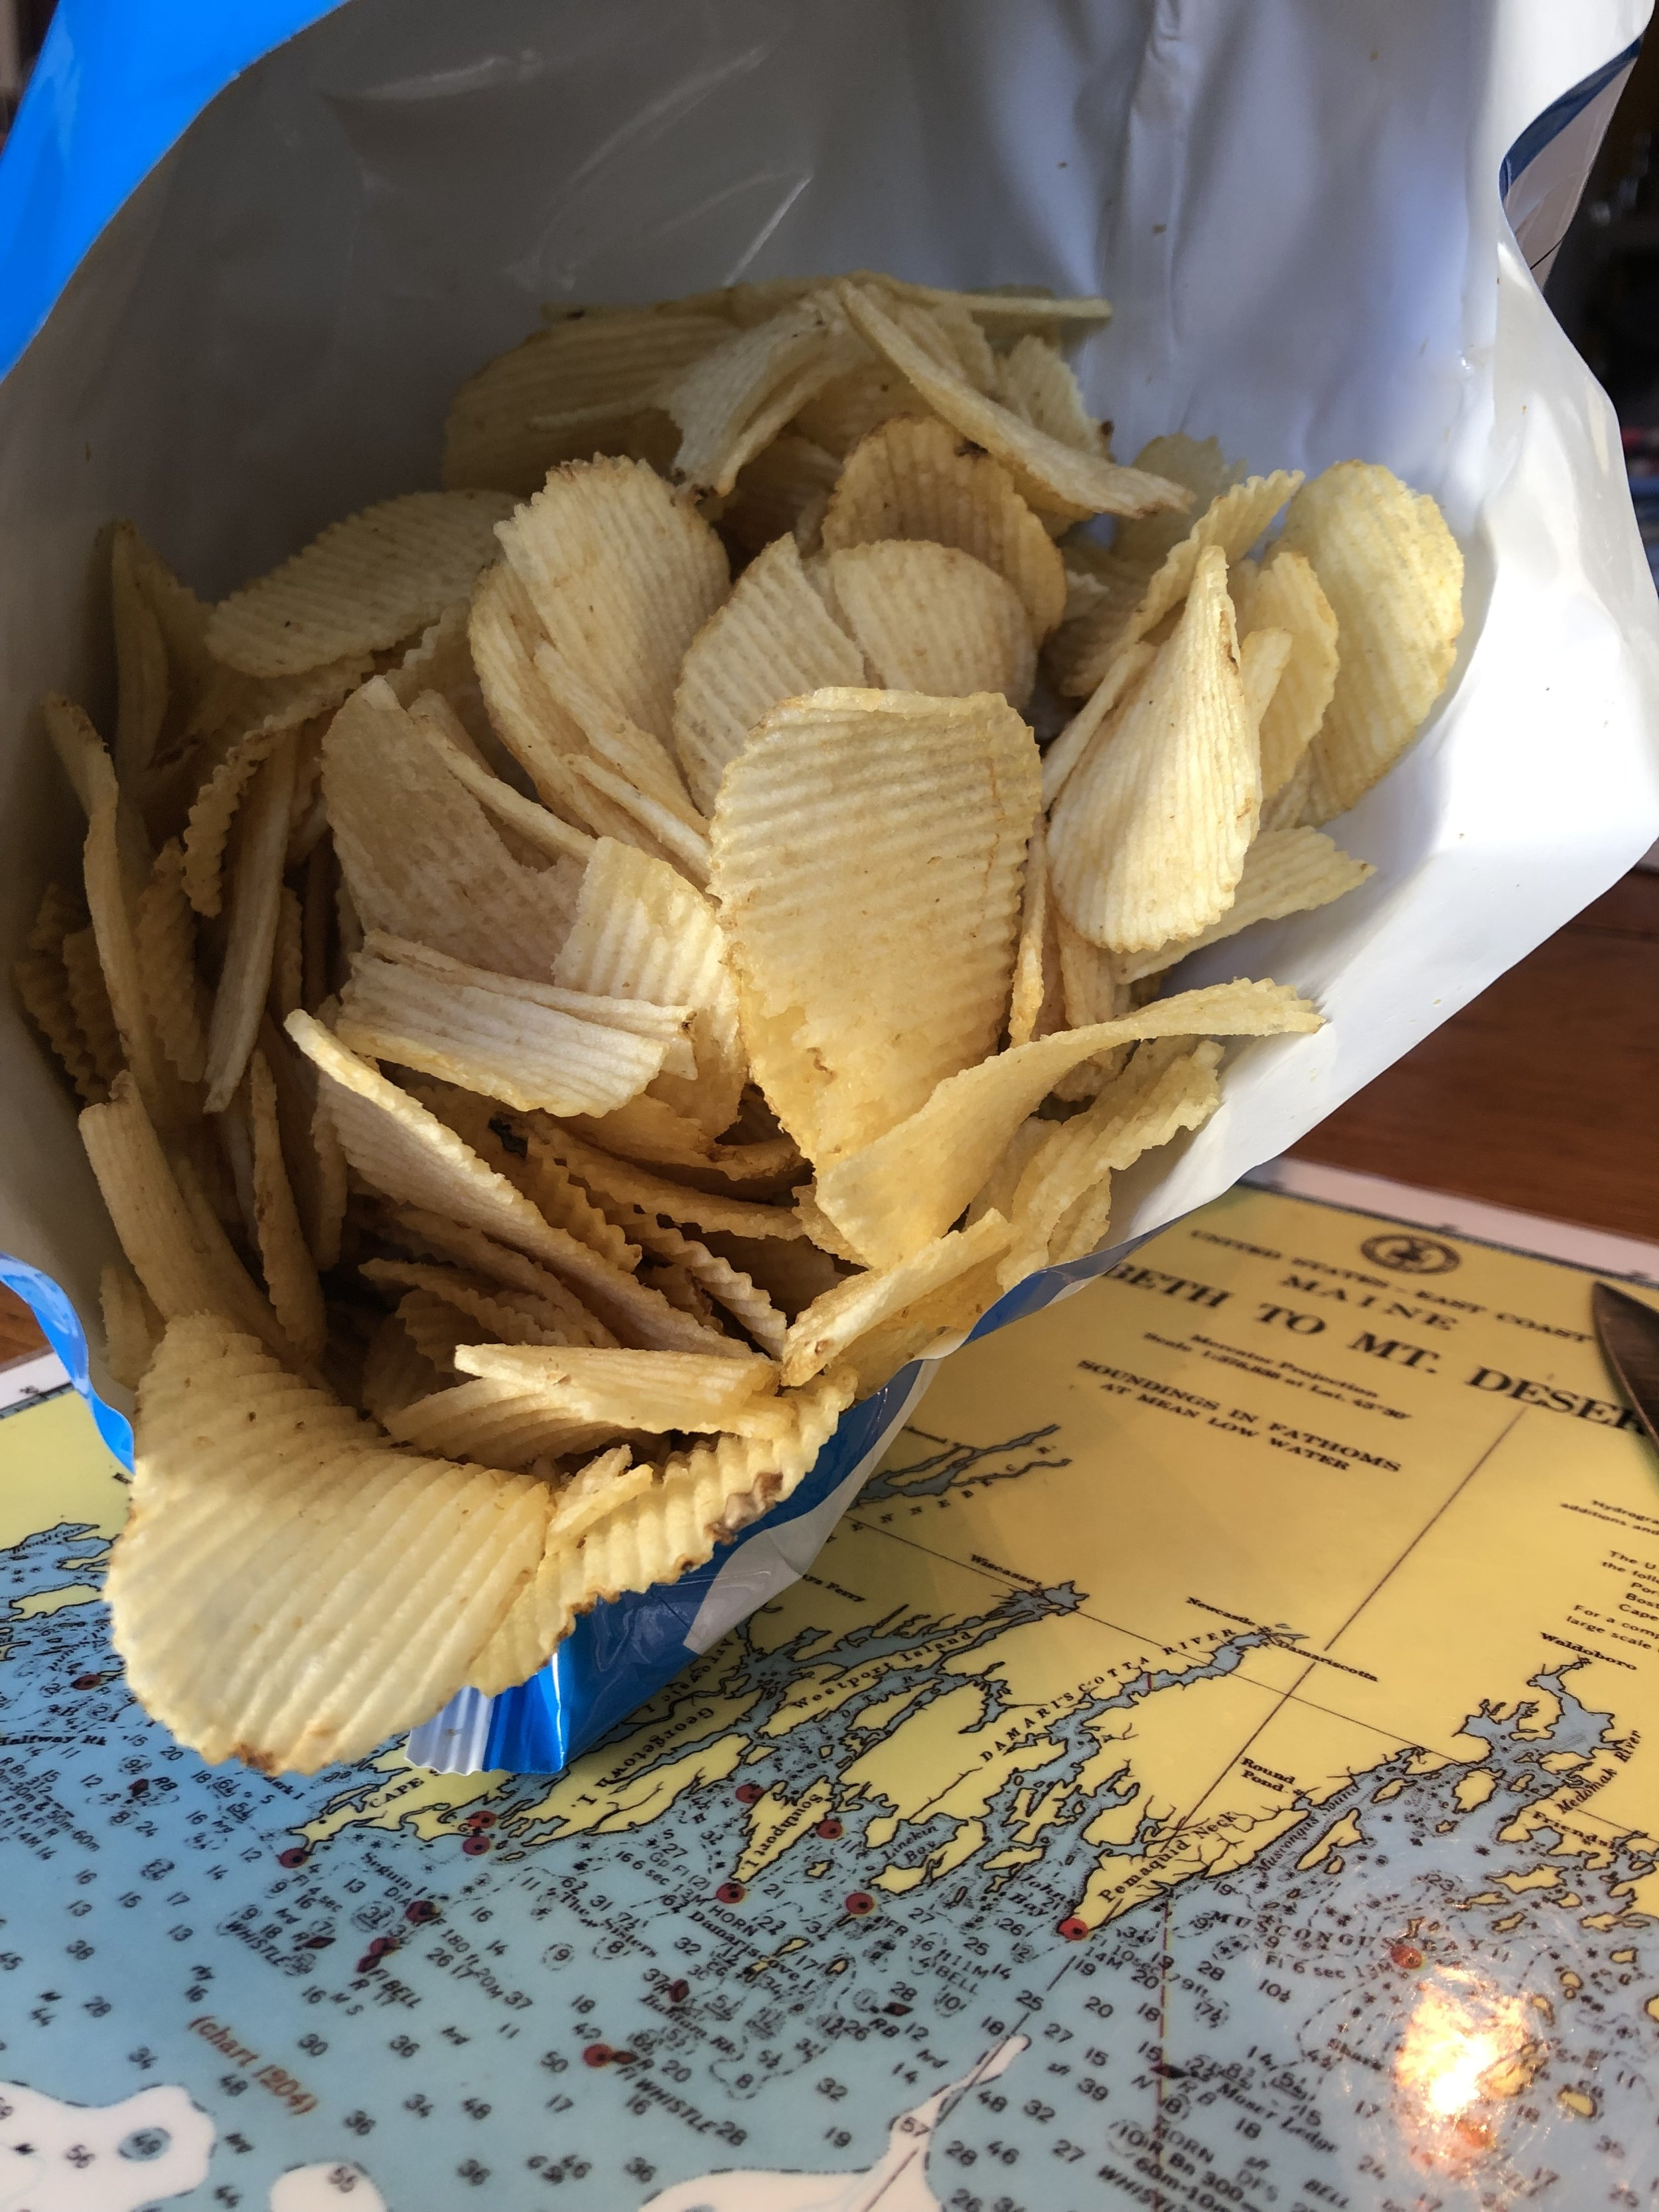 Potato chip proof